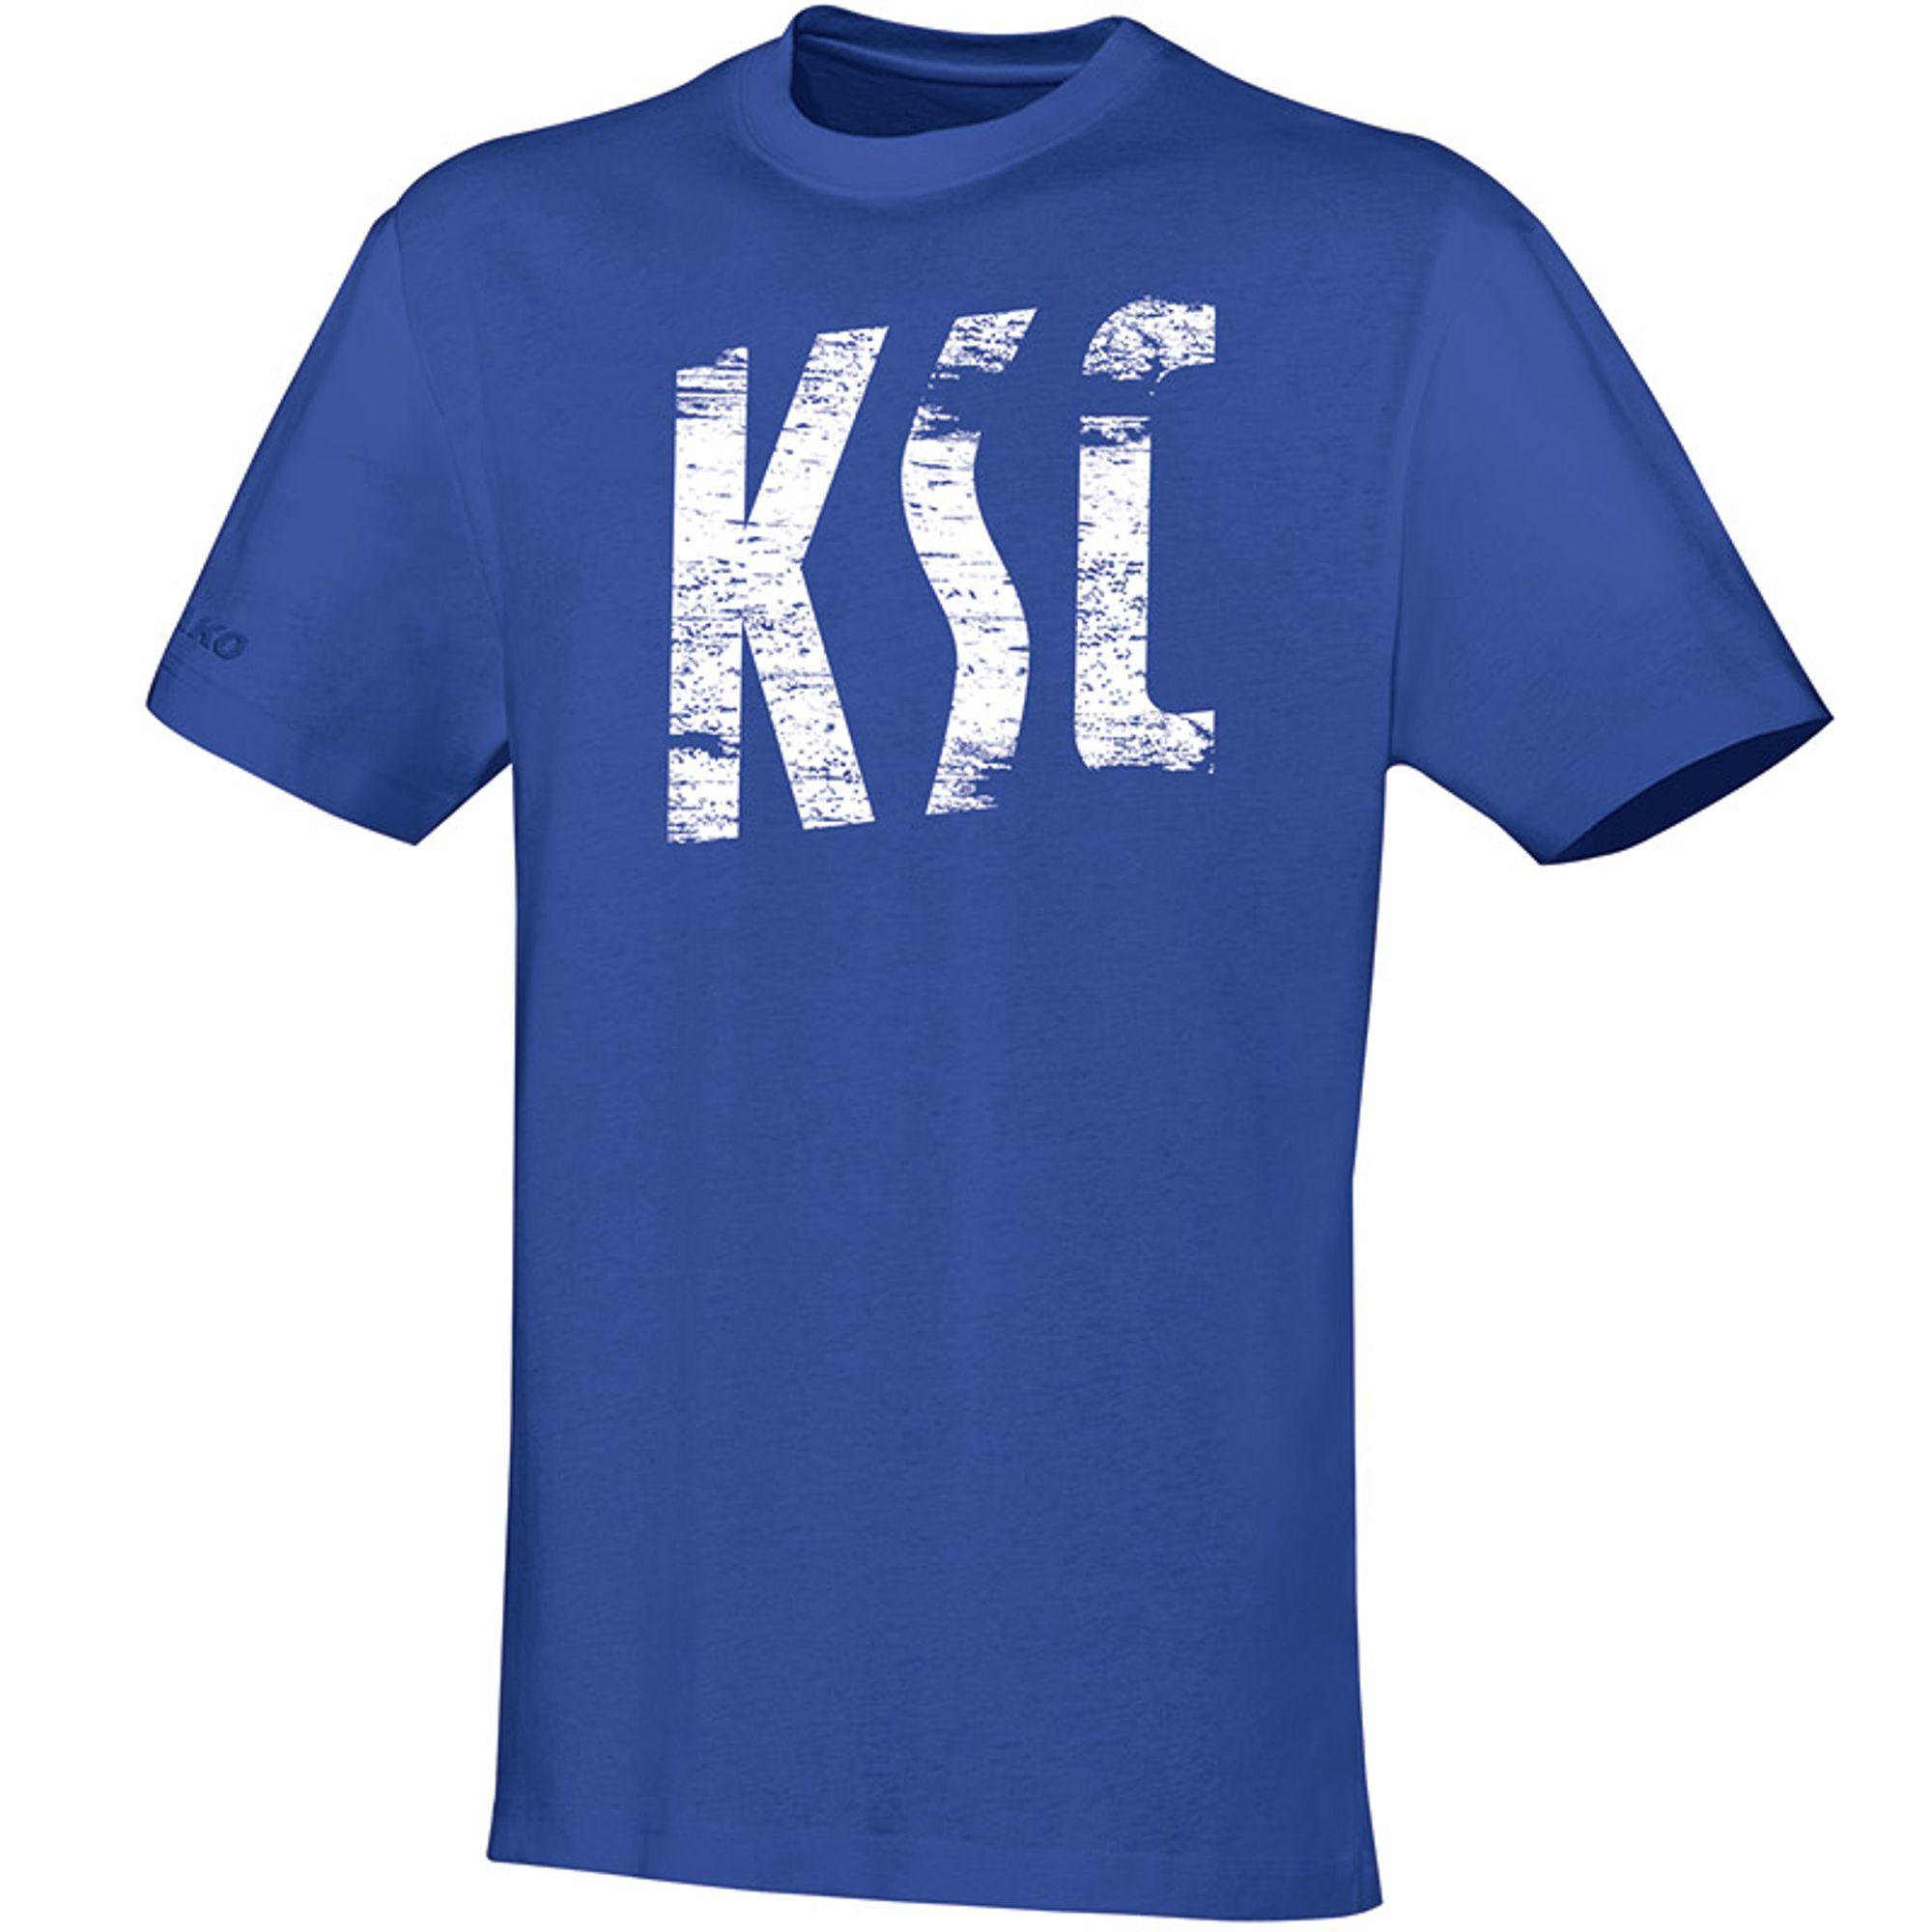 """Jako """"Karlsruher SC T- Shirt """"""""Vintage"""""""""""" - royal"""